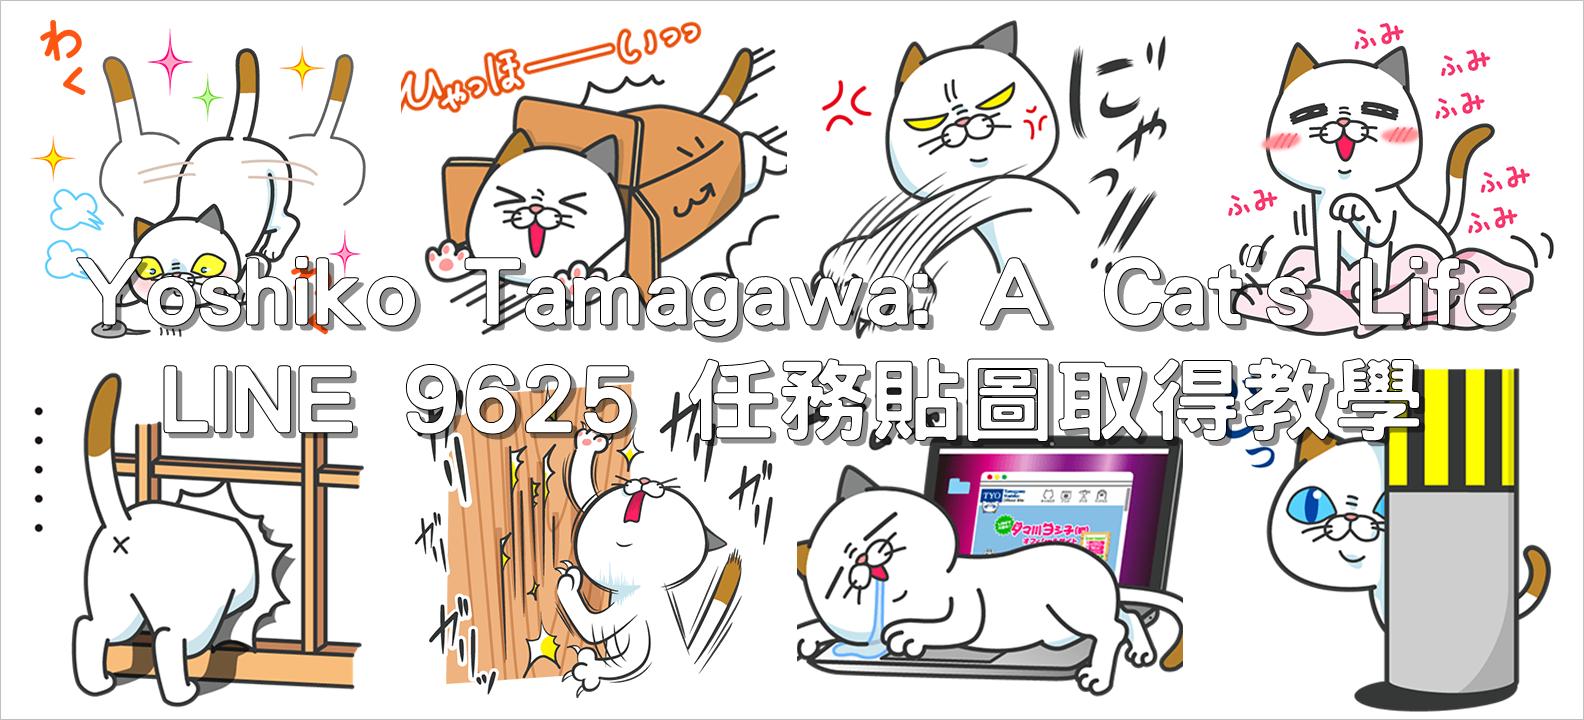 Yoshiko Tamagawa: A Cat's Life,LINE 9625 任務貼圖取得教學